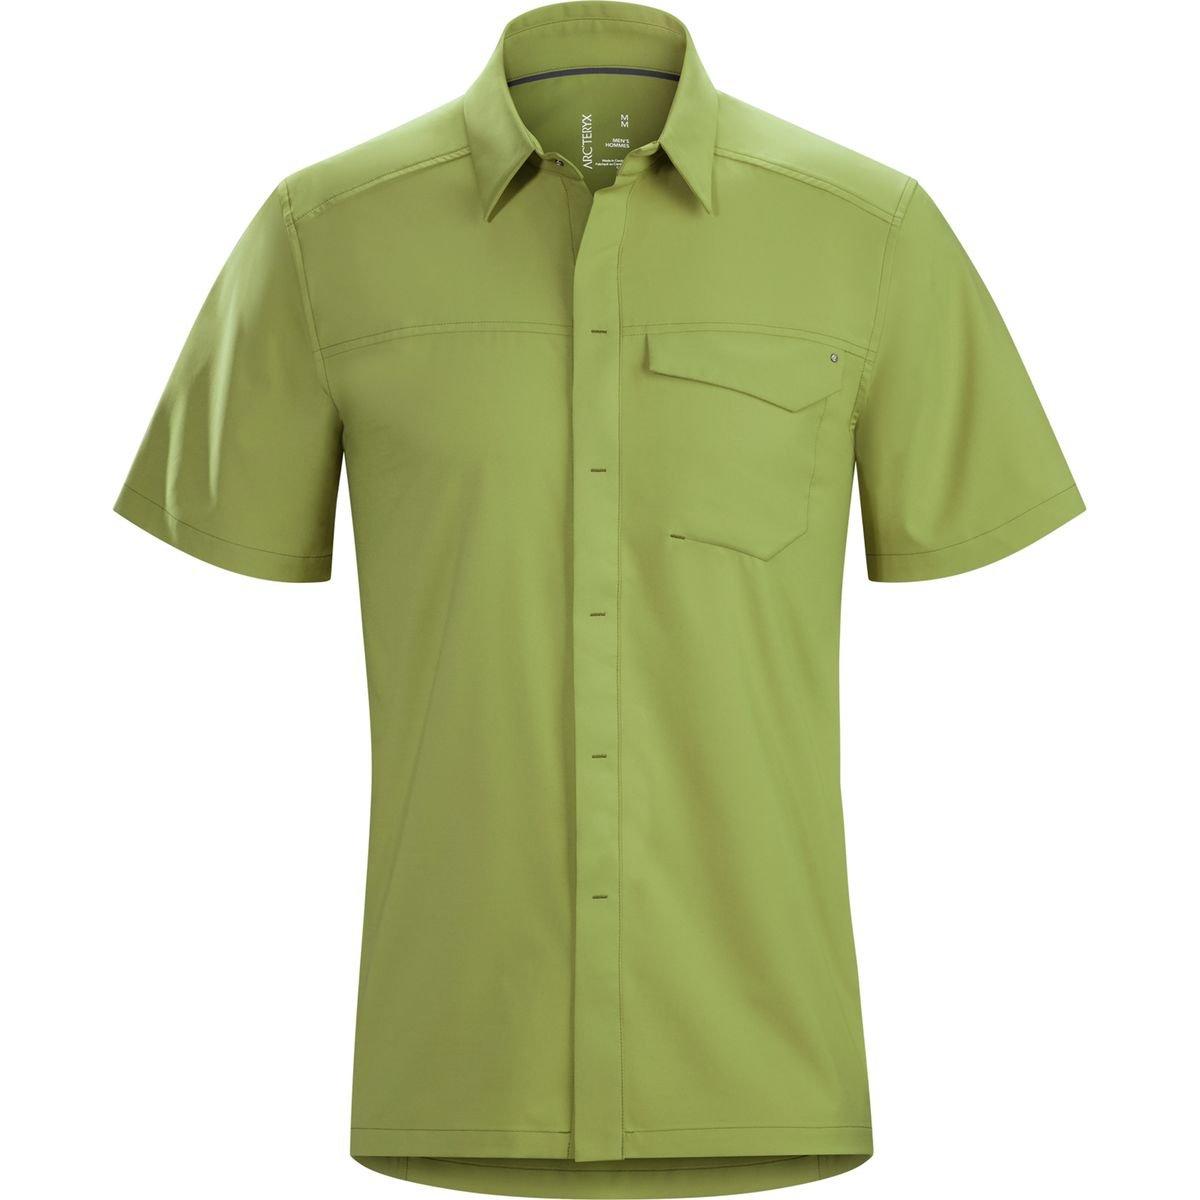 ARC'TERYX(アークテリクス) Skyline SS Shirt Men'sスカイライン シャツ メンズ 19076 B01GFNB3KG X-Large|アザミ アザミ X-Large